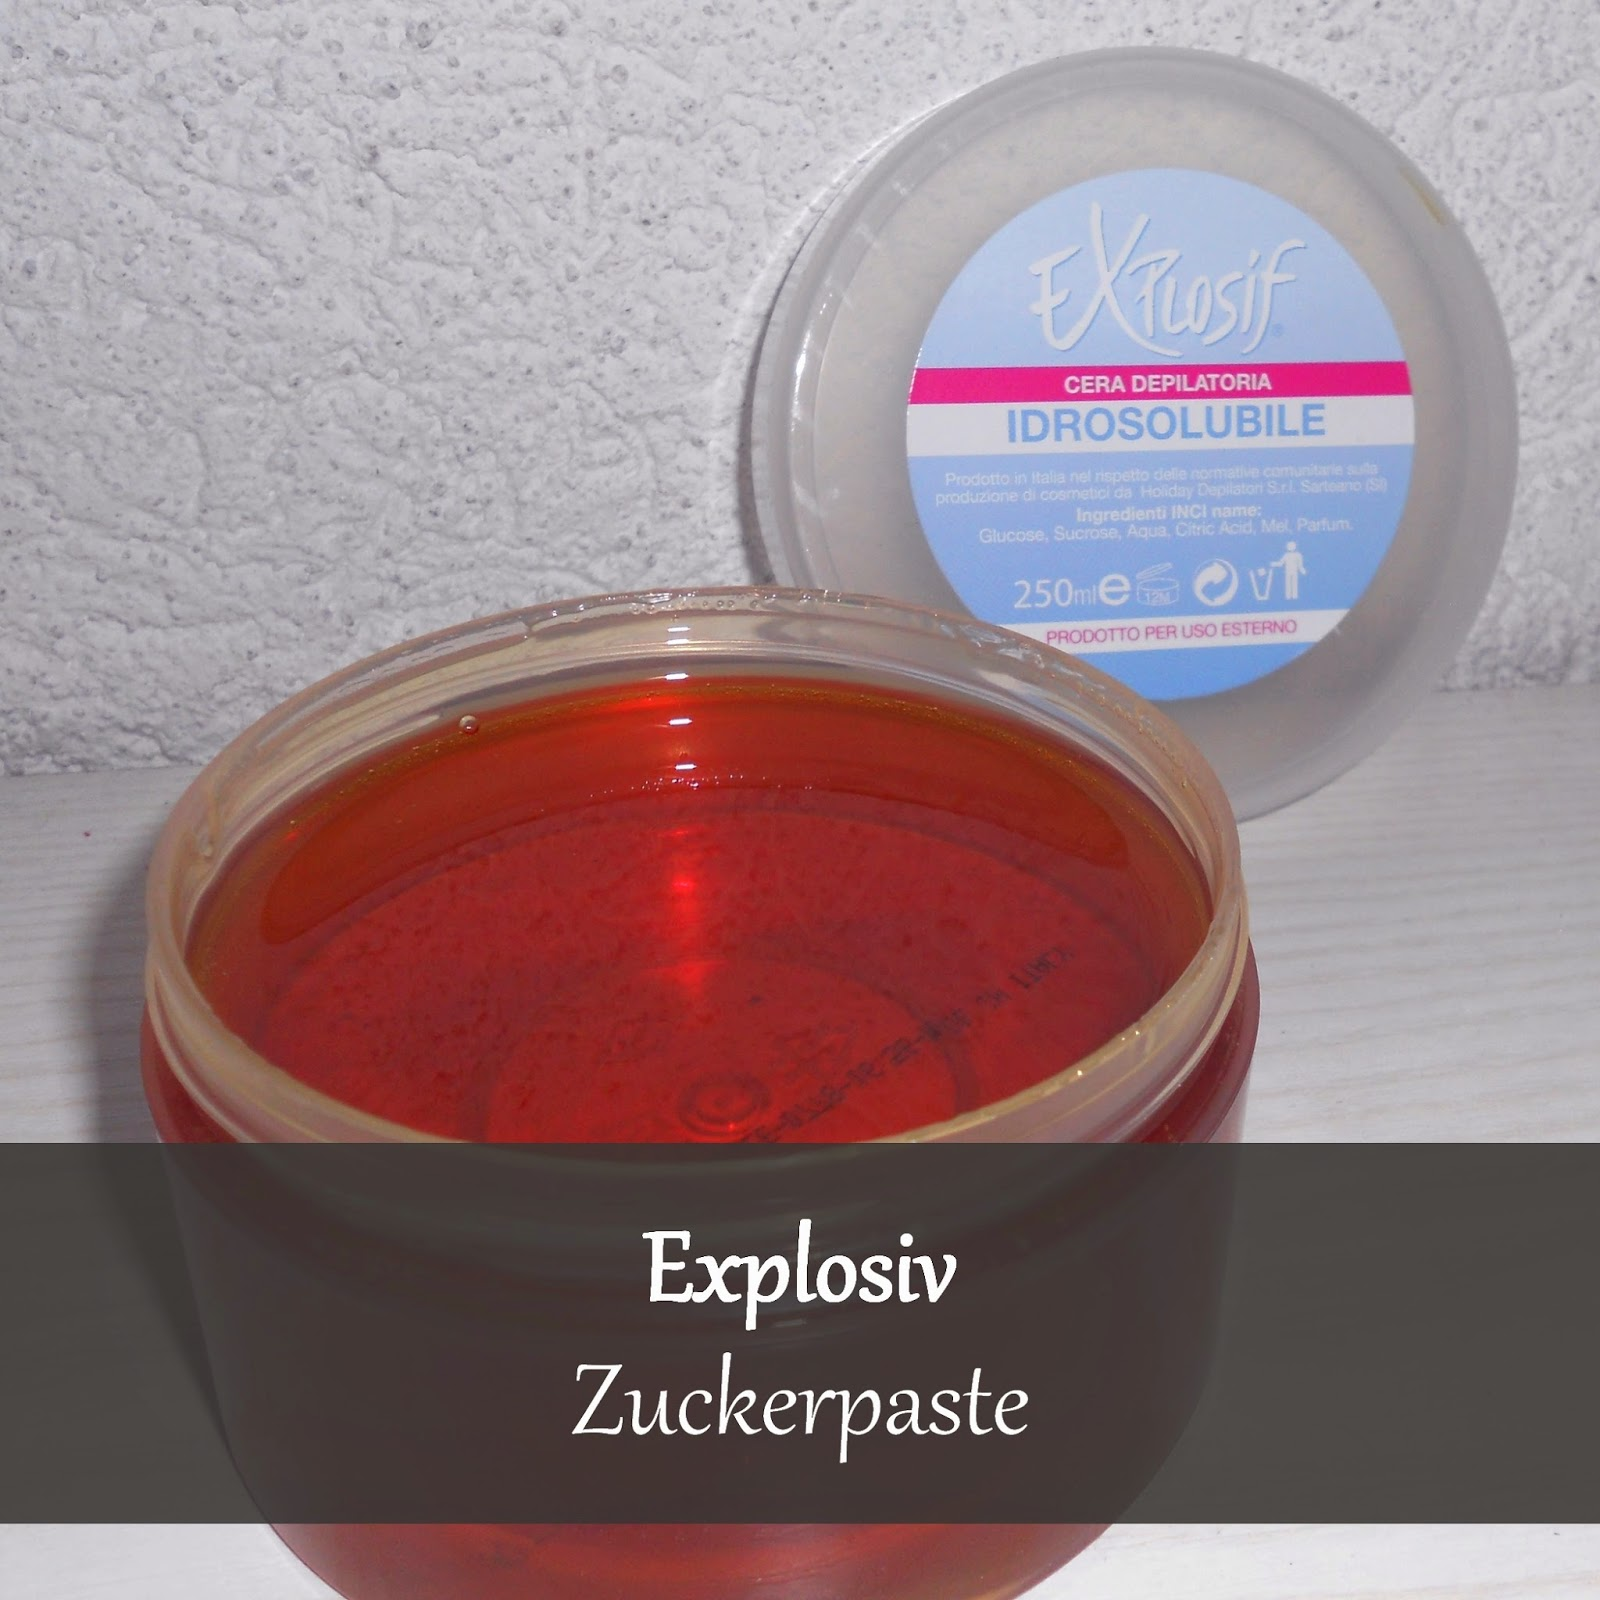 http://www.kleines-schmuckstueck.blogspot.de/2013/12/review-explosif-zuckerpaste-sugaring.html